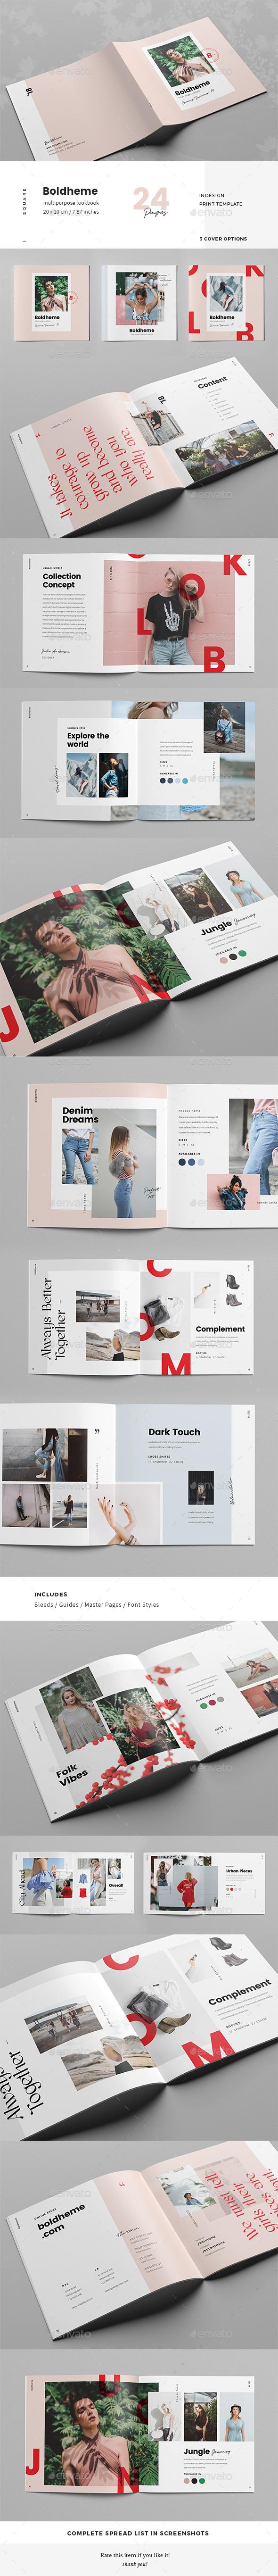 GraphicRiver Boldheme Modern Lookbook & Catalog 20870265